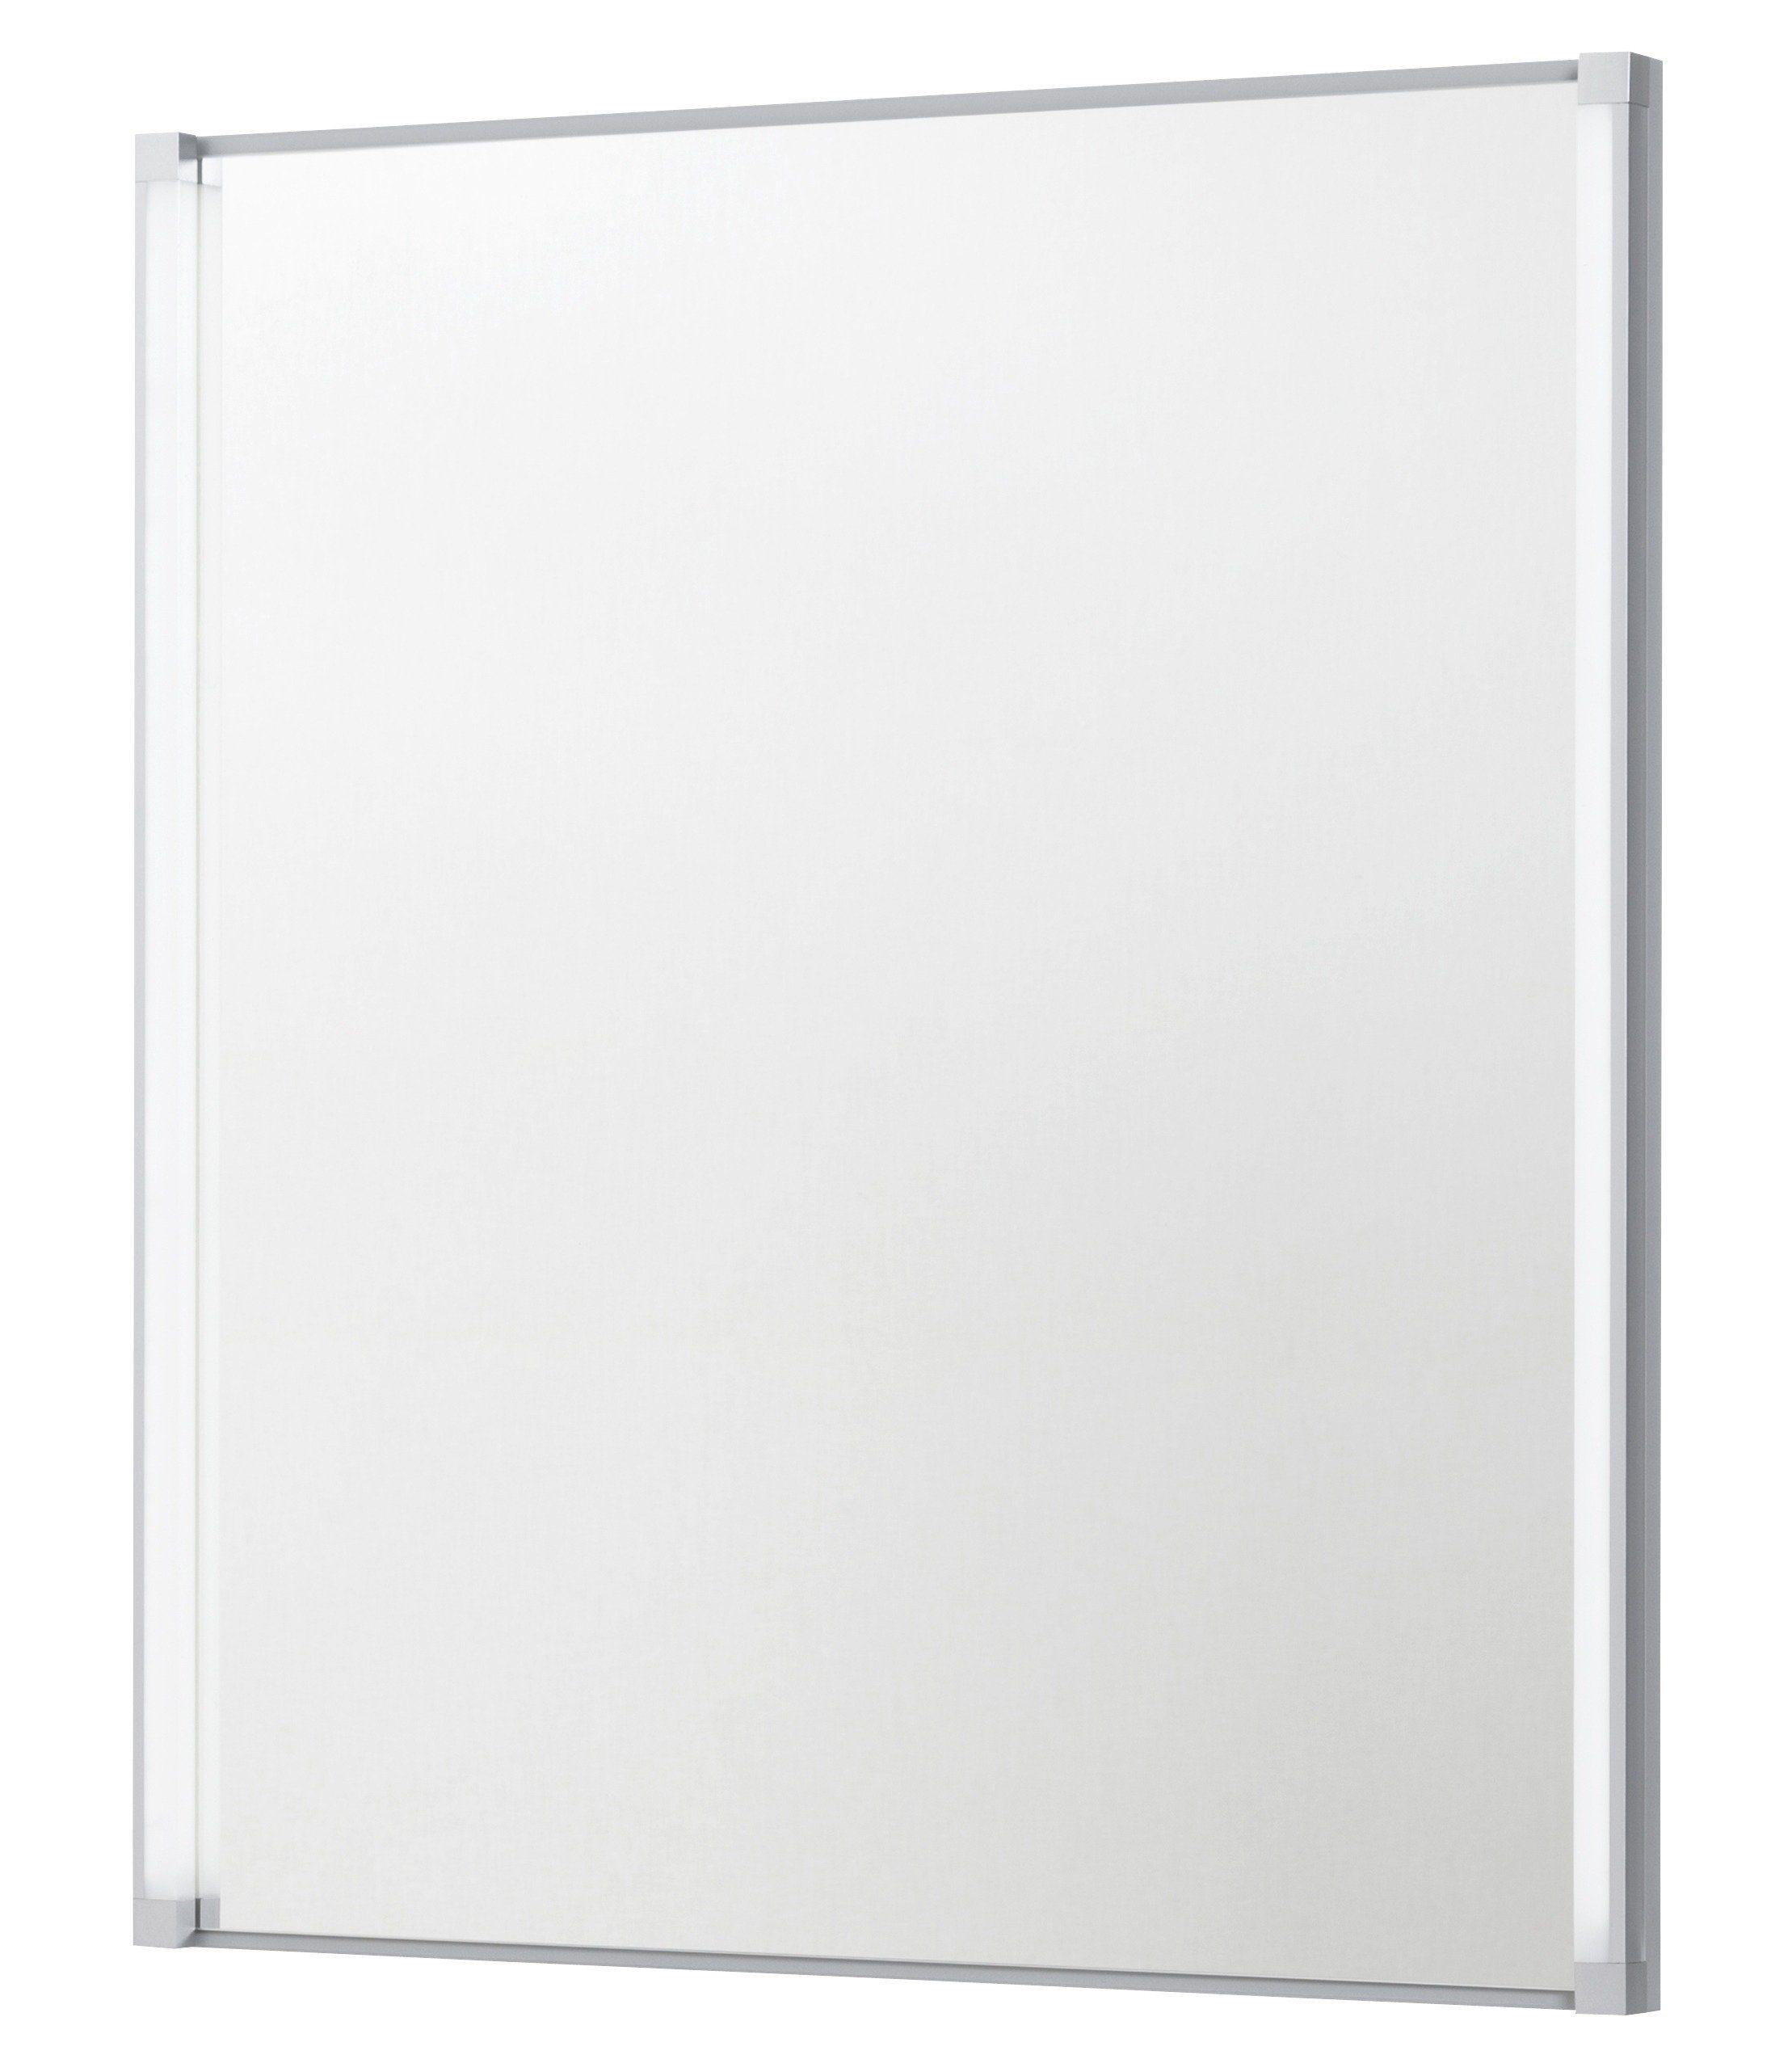 Spiegel »LED-LINE« Breite 60,5 cm, mit LED-Beleuchtung